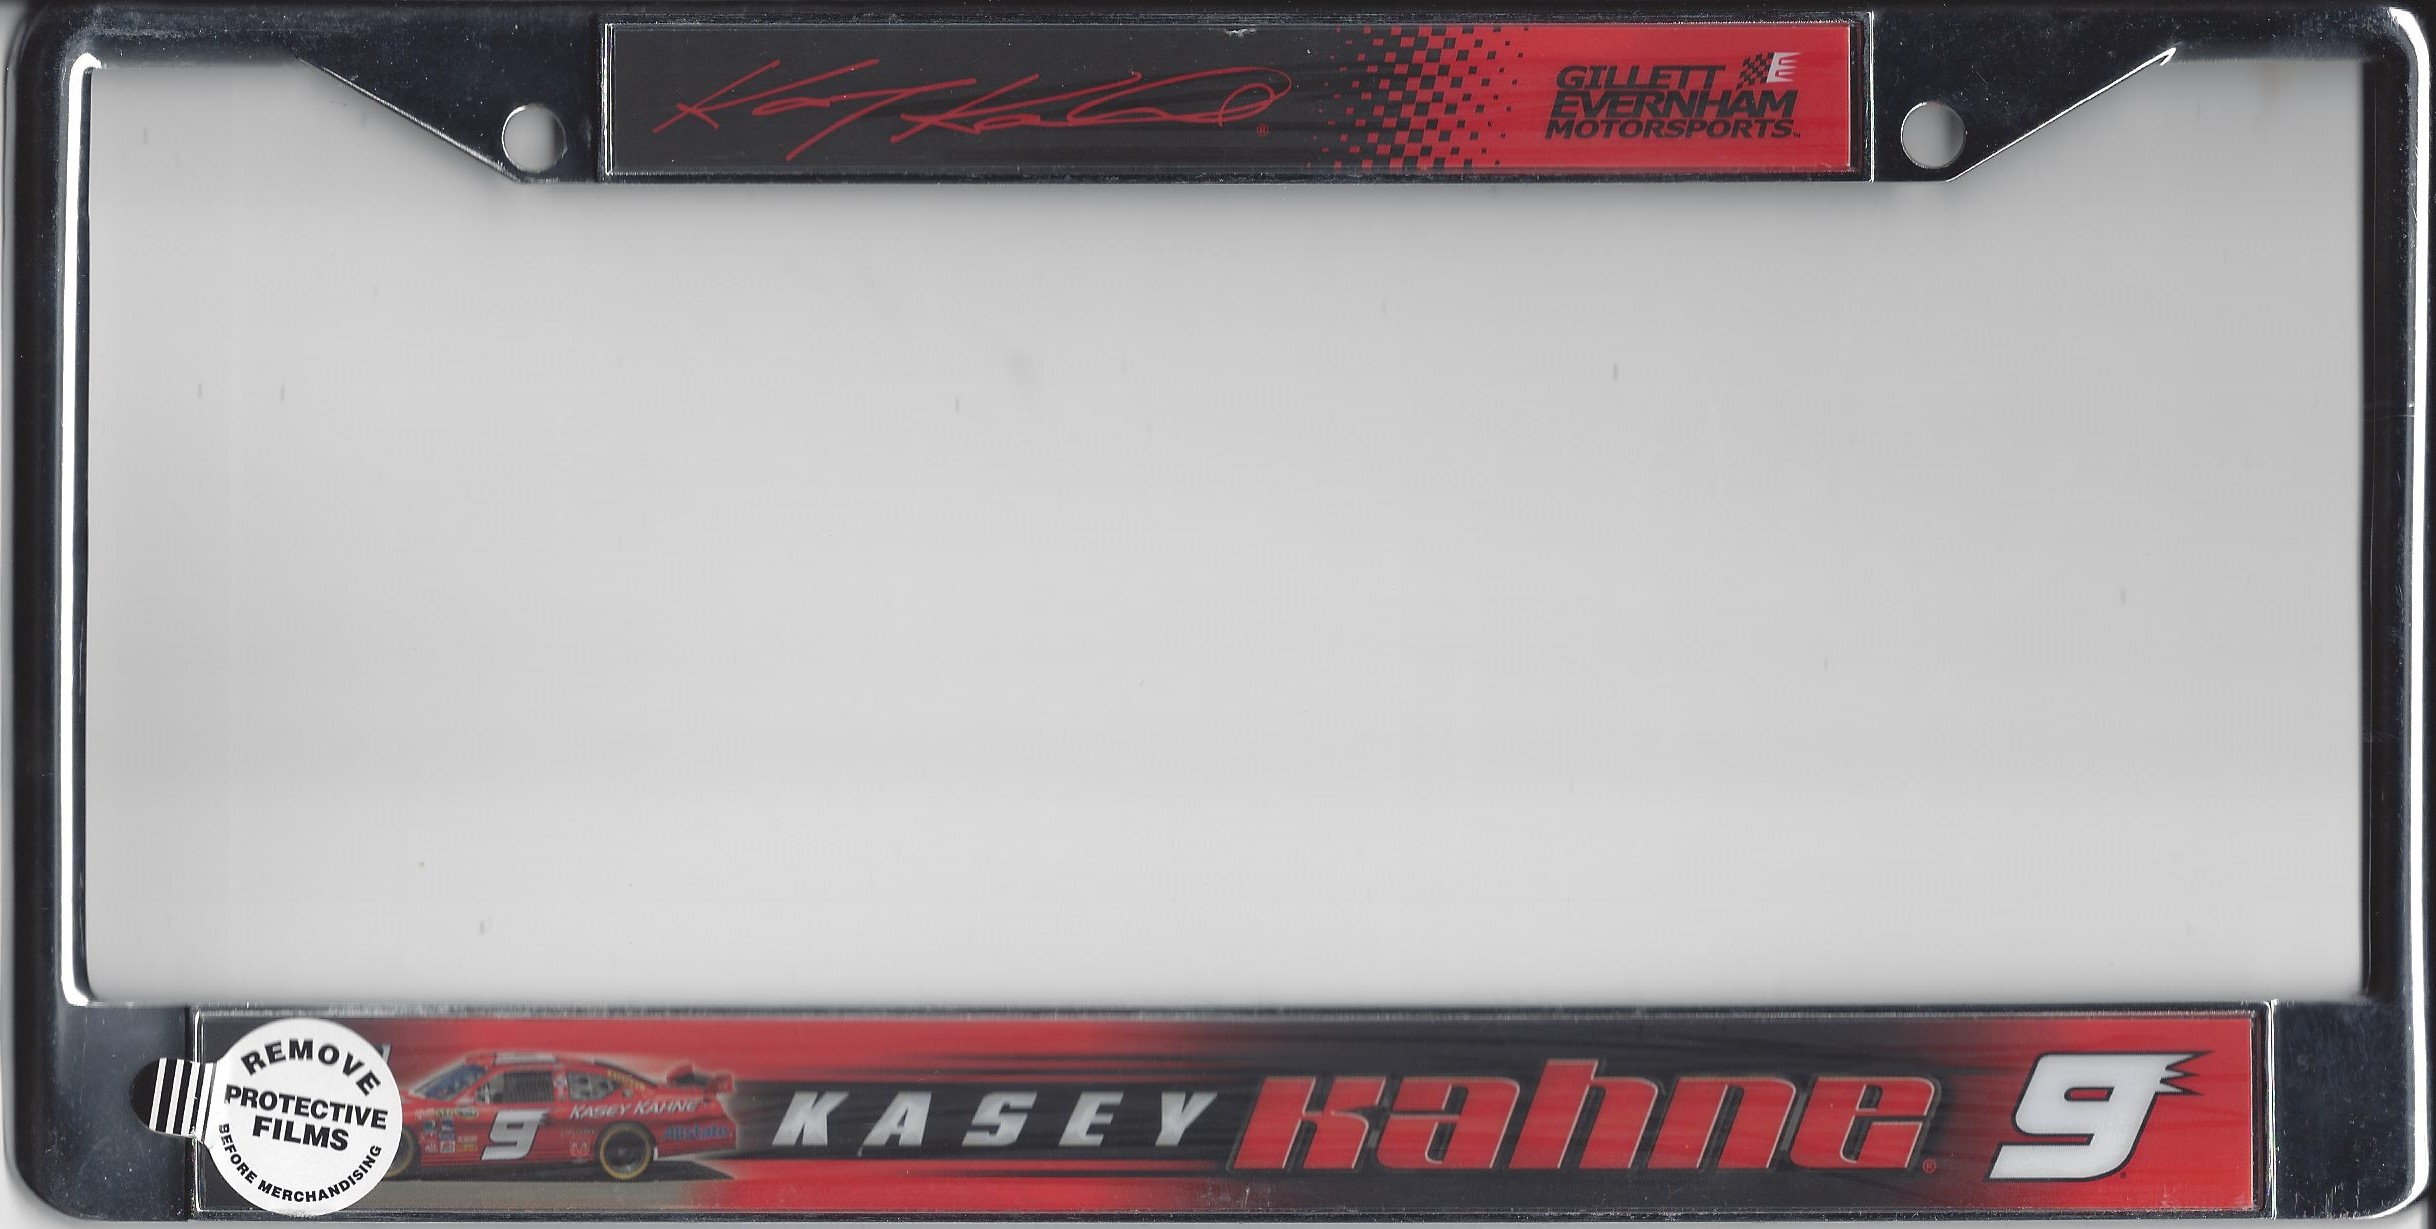 Kasey Kahne #9 License Plate Frame Kasey Kahne #9 License Plate ...